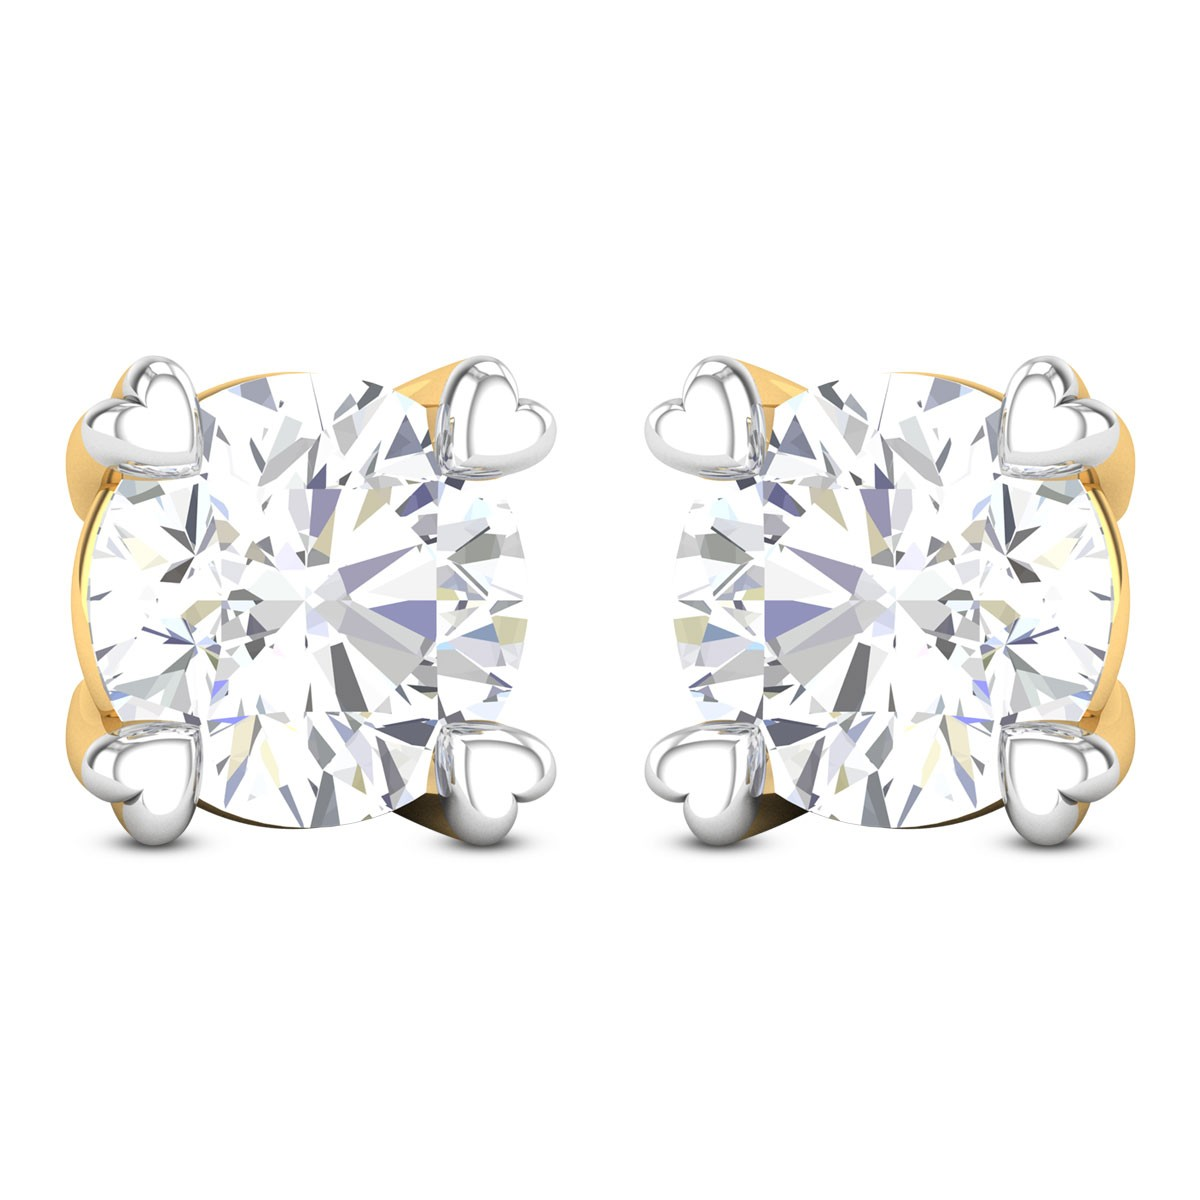 Unmada Solitaire Stud Earrings